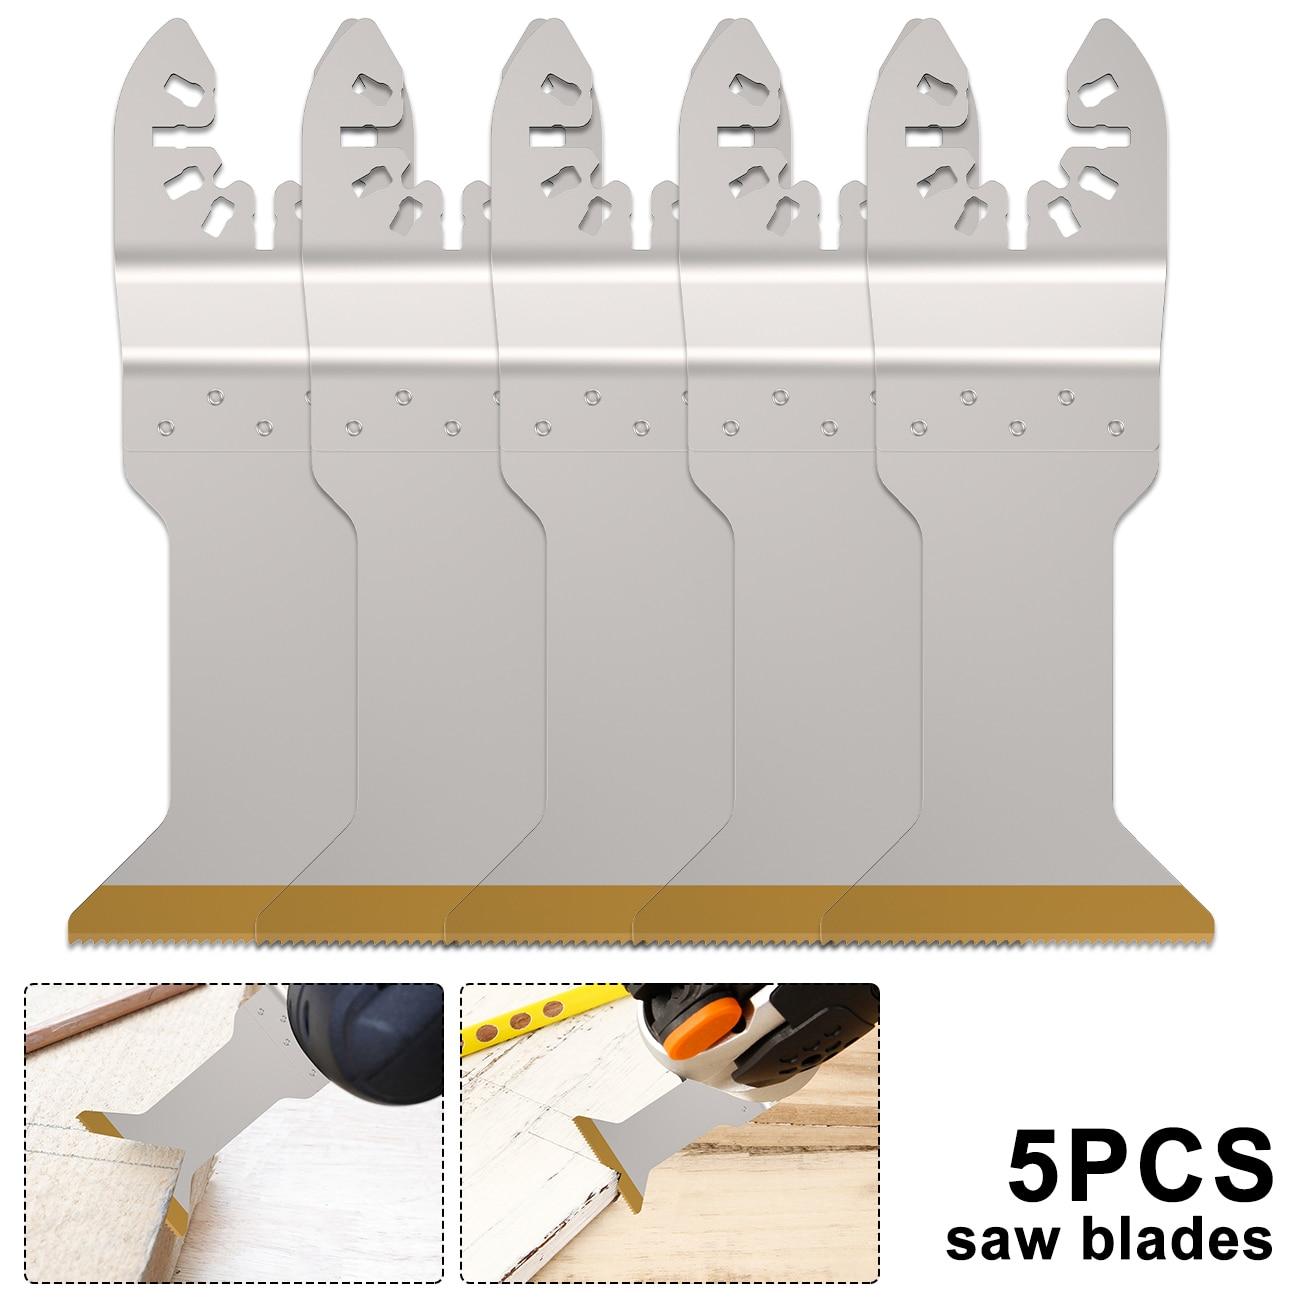 5pcs/set Multi-Function Bi-metal Precision Saw Blade Oscillating Saw Blade for Renovator Power Cutting Multimaster Tools